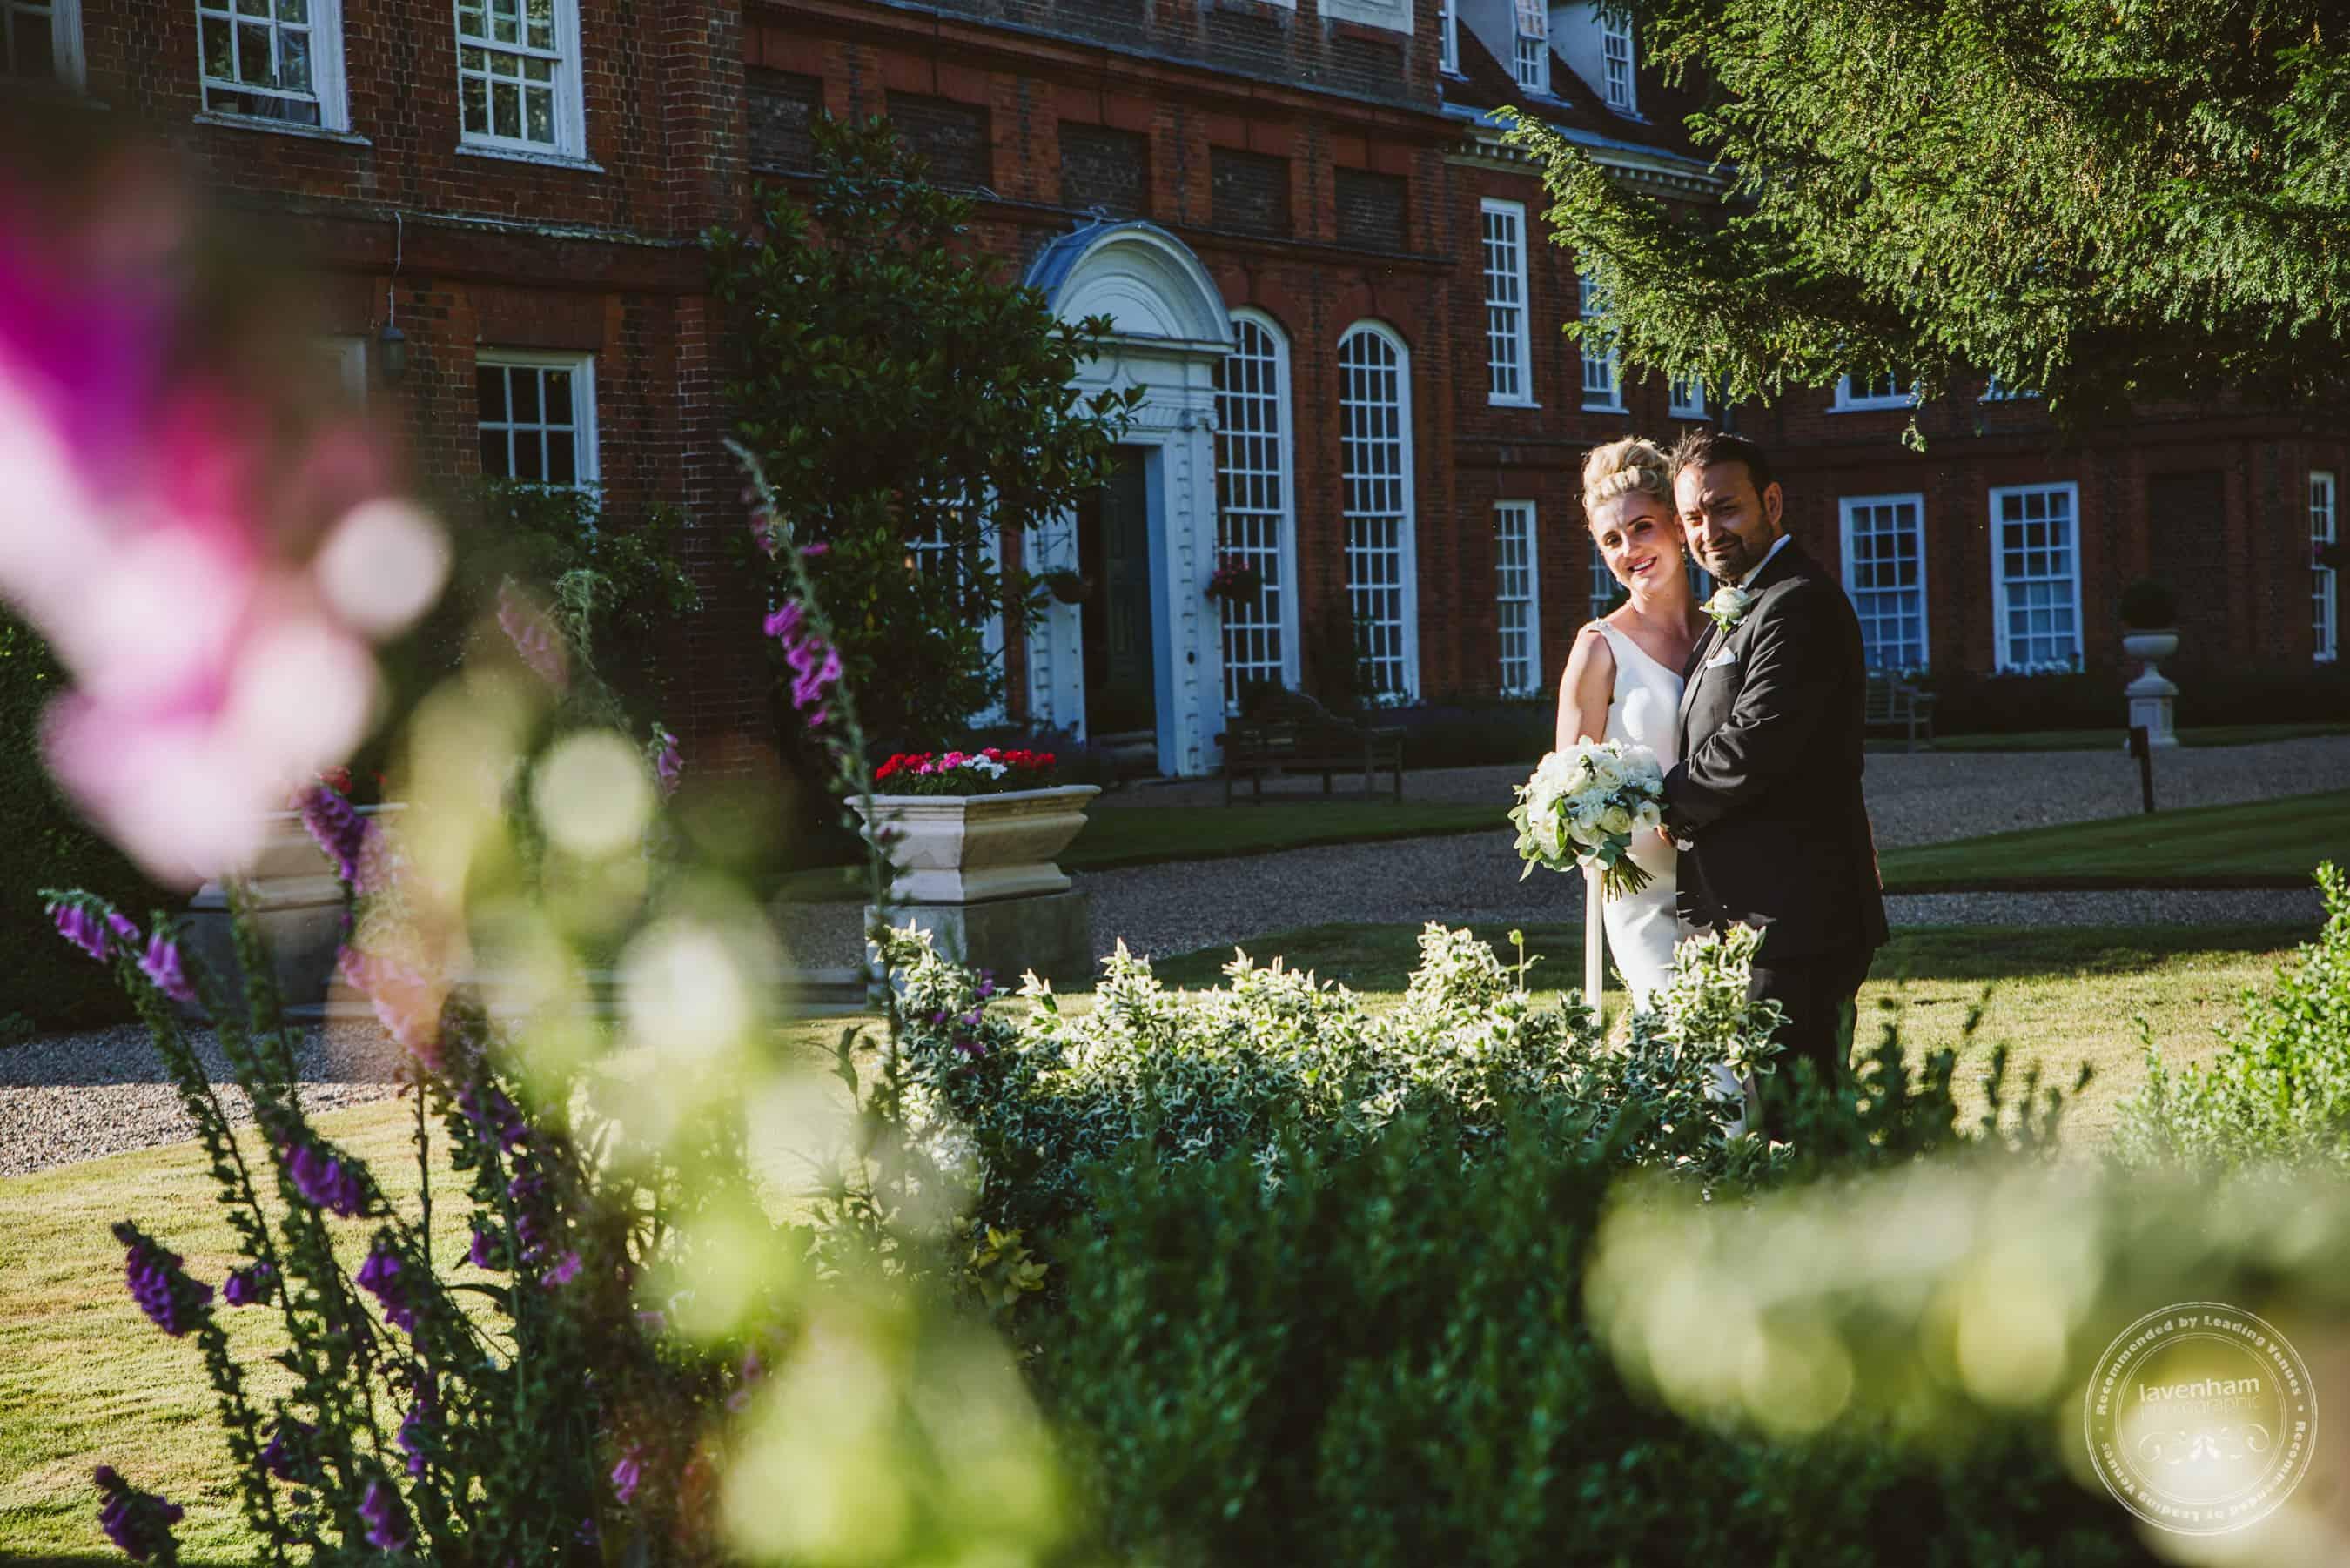 220618 Gosfield Hall Wedding Photography Lavenham Photographic 0152